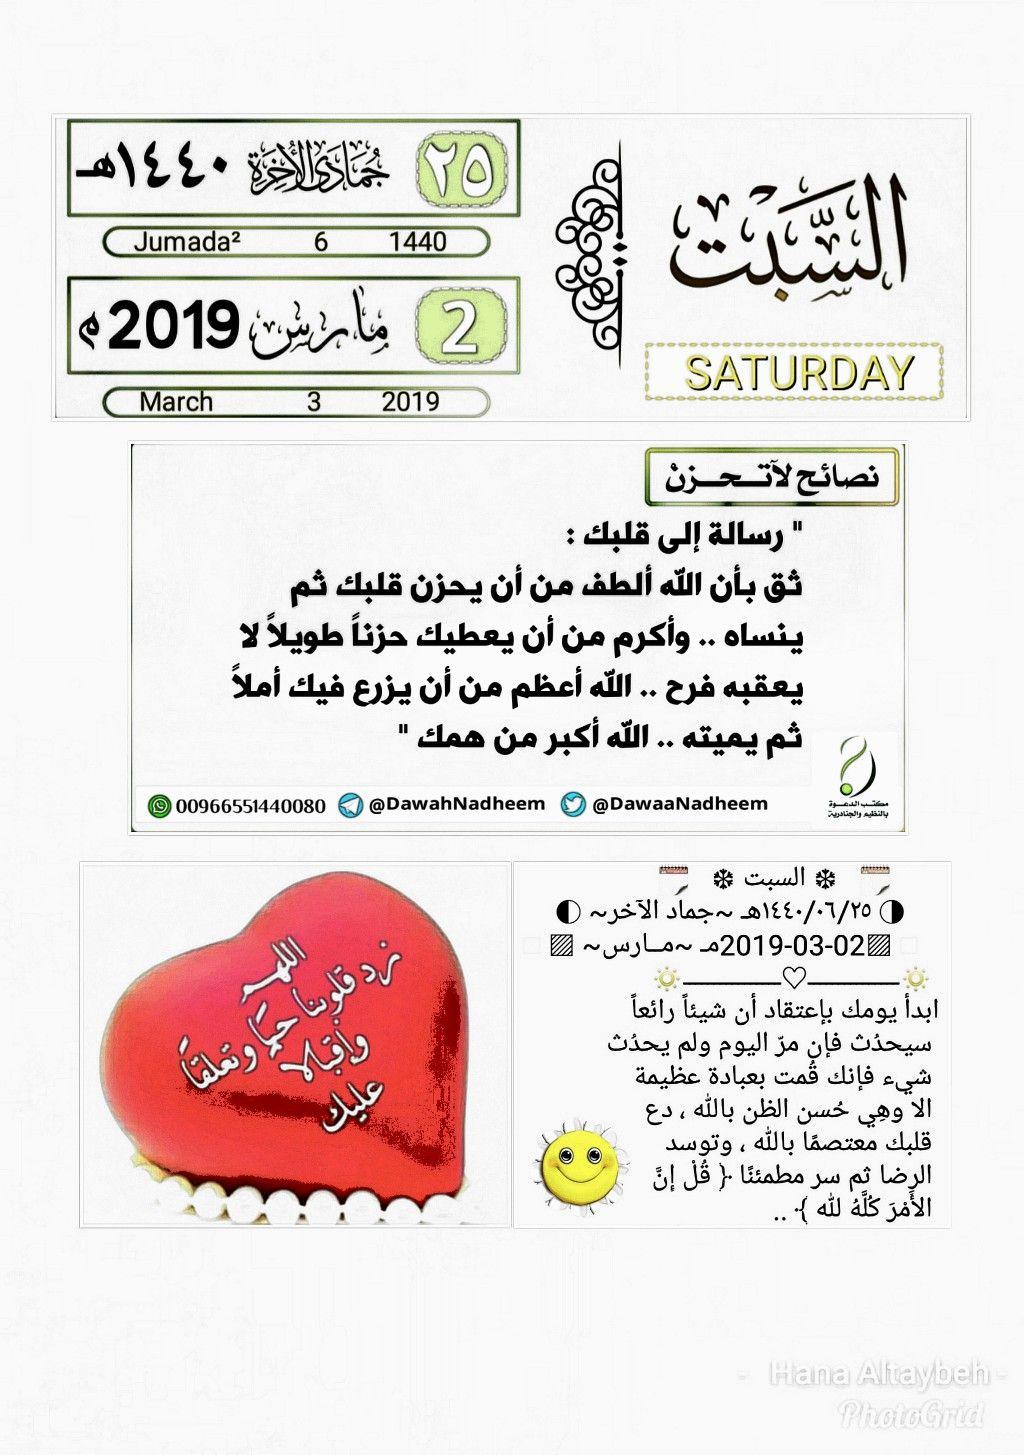 Pin By Hana Al Taybeh On التقويم الميلادي والهجري March 3rd March